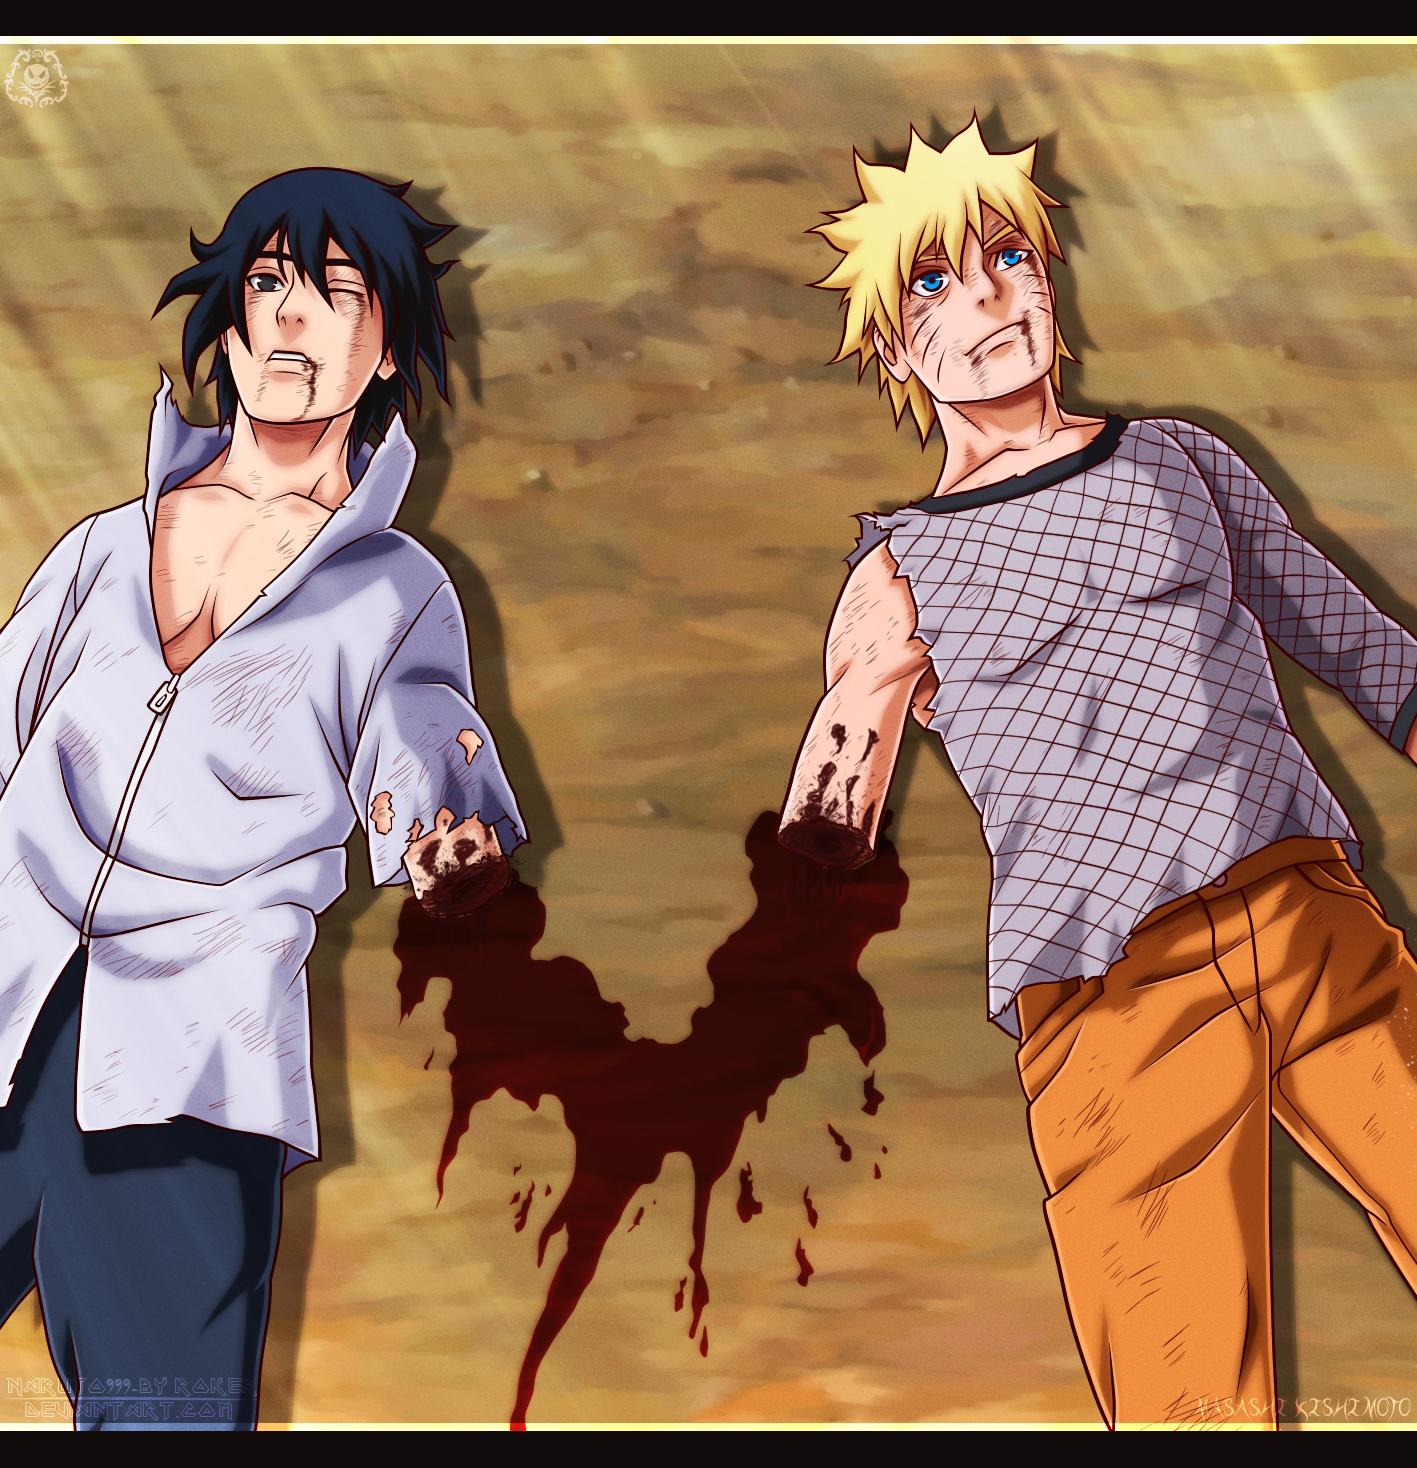 Naruto-&-Sasuke-(Manga---698) by NARUTO999-BY-ROKER on deviantART